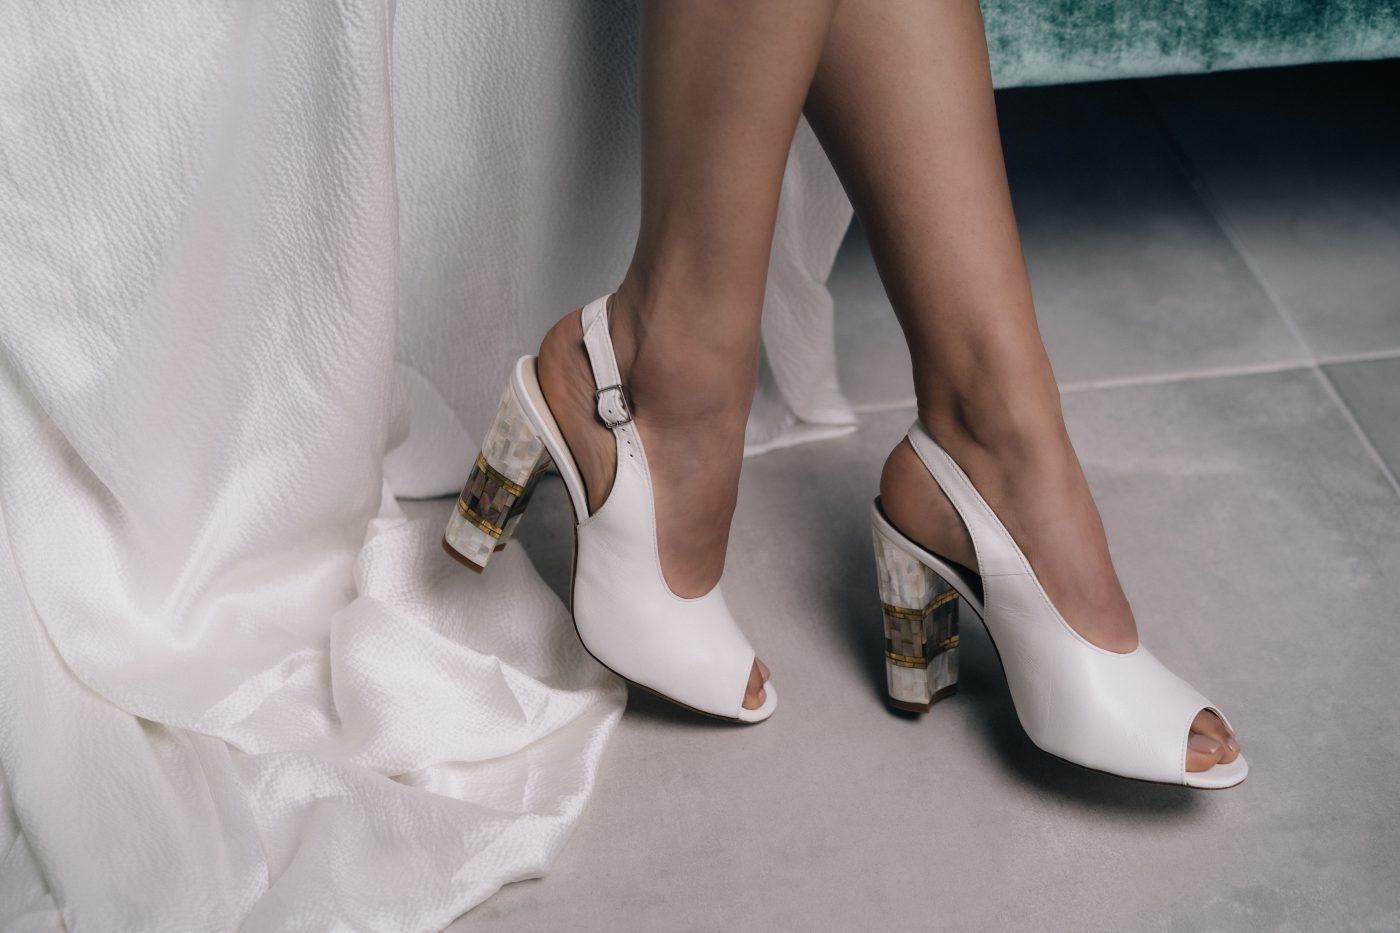 "<a href=""https://freyarose.com/collections/wedding-shoes/products/zara-white"" target=""_blank"" rel=""noopener noreferrer"">Zara White Peep Toe by Freya Rose</a> £495"